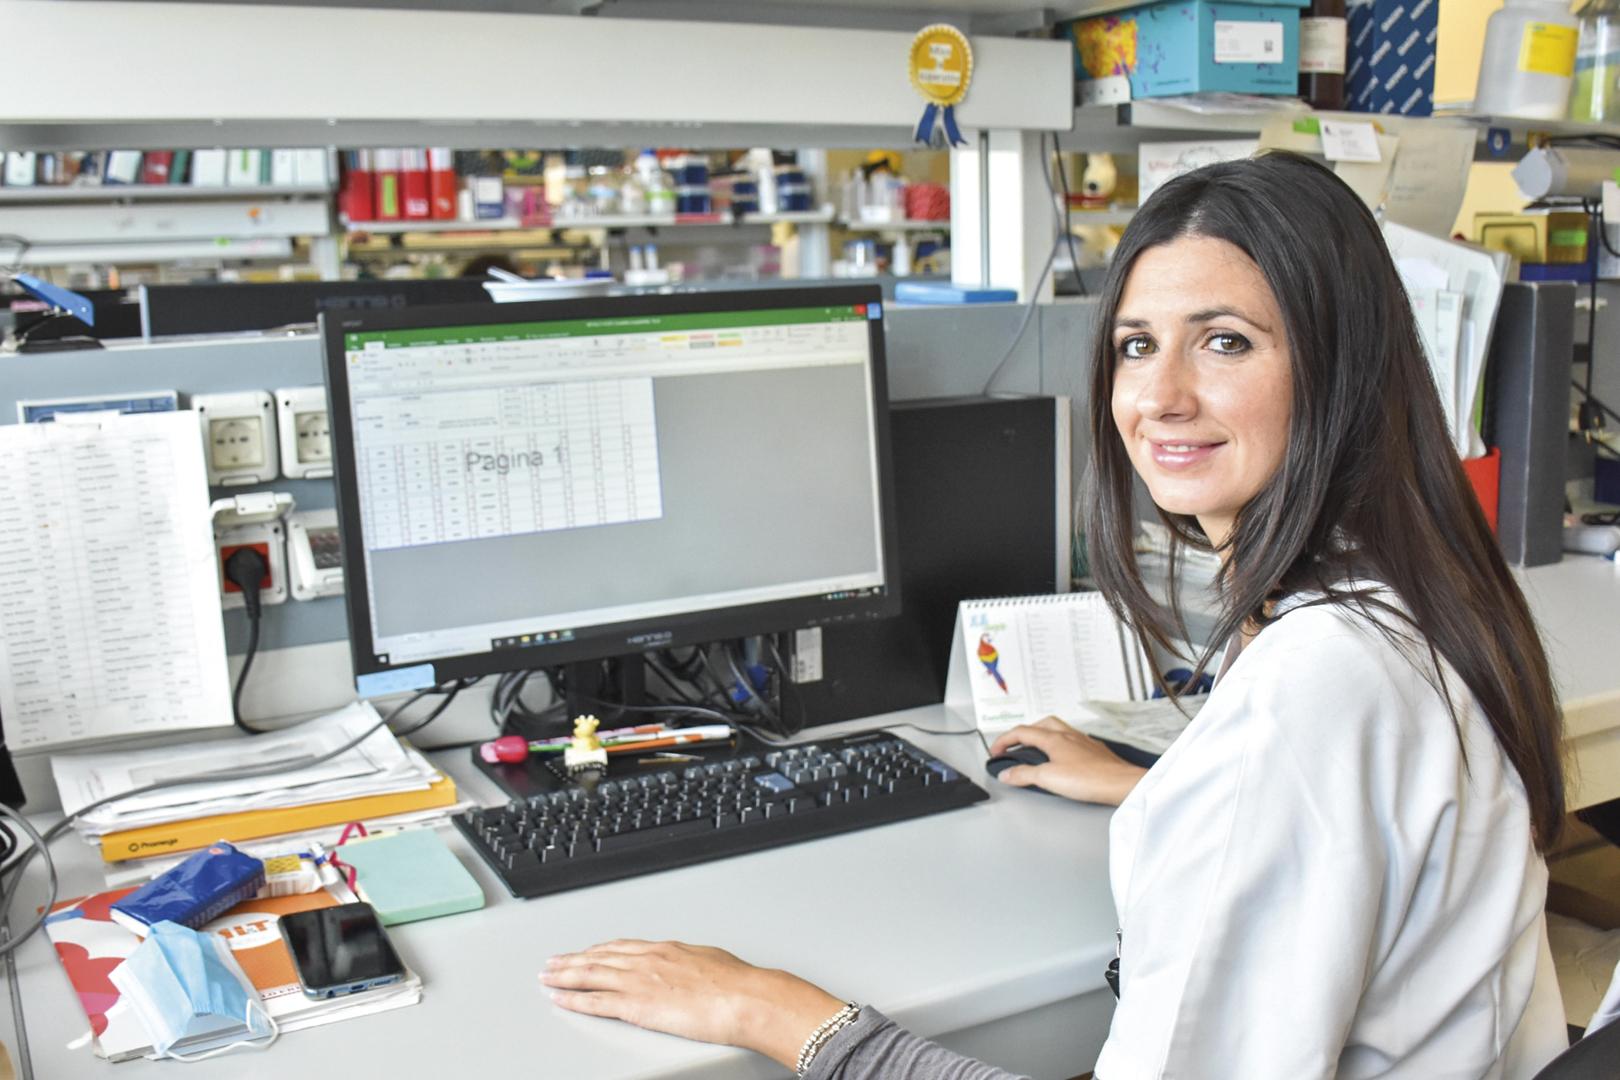 La ricercatrice Giorgia Gurioli